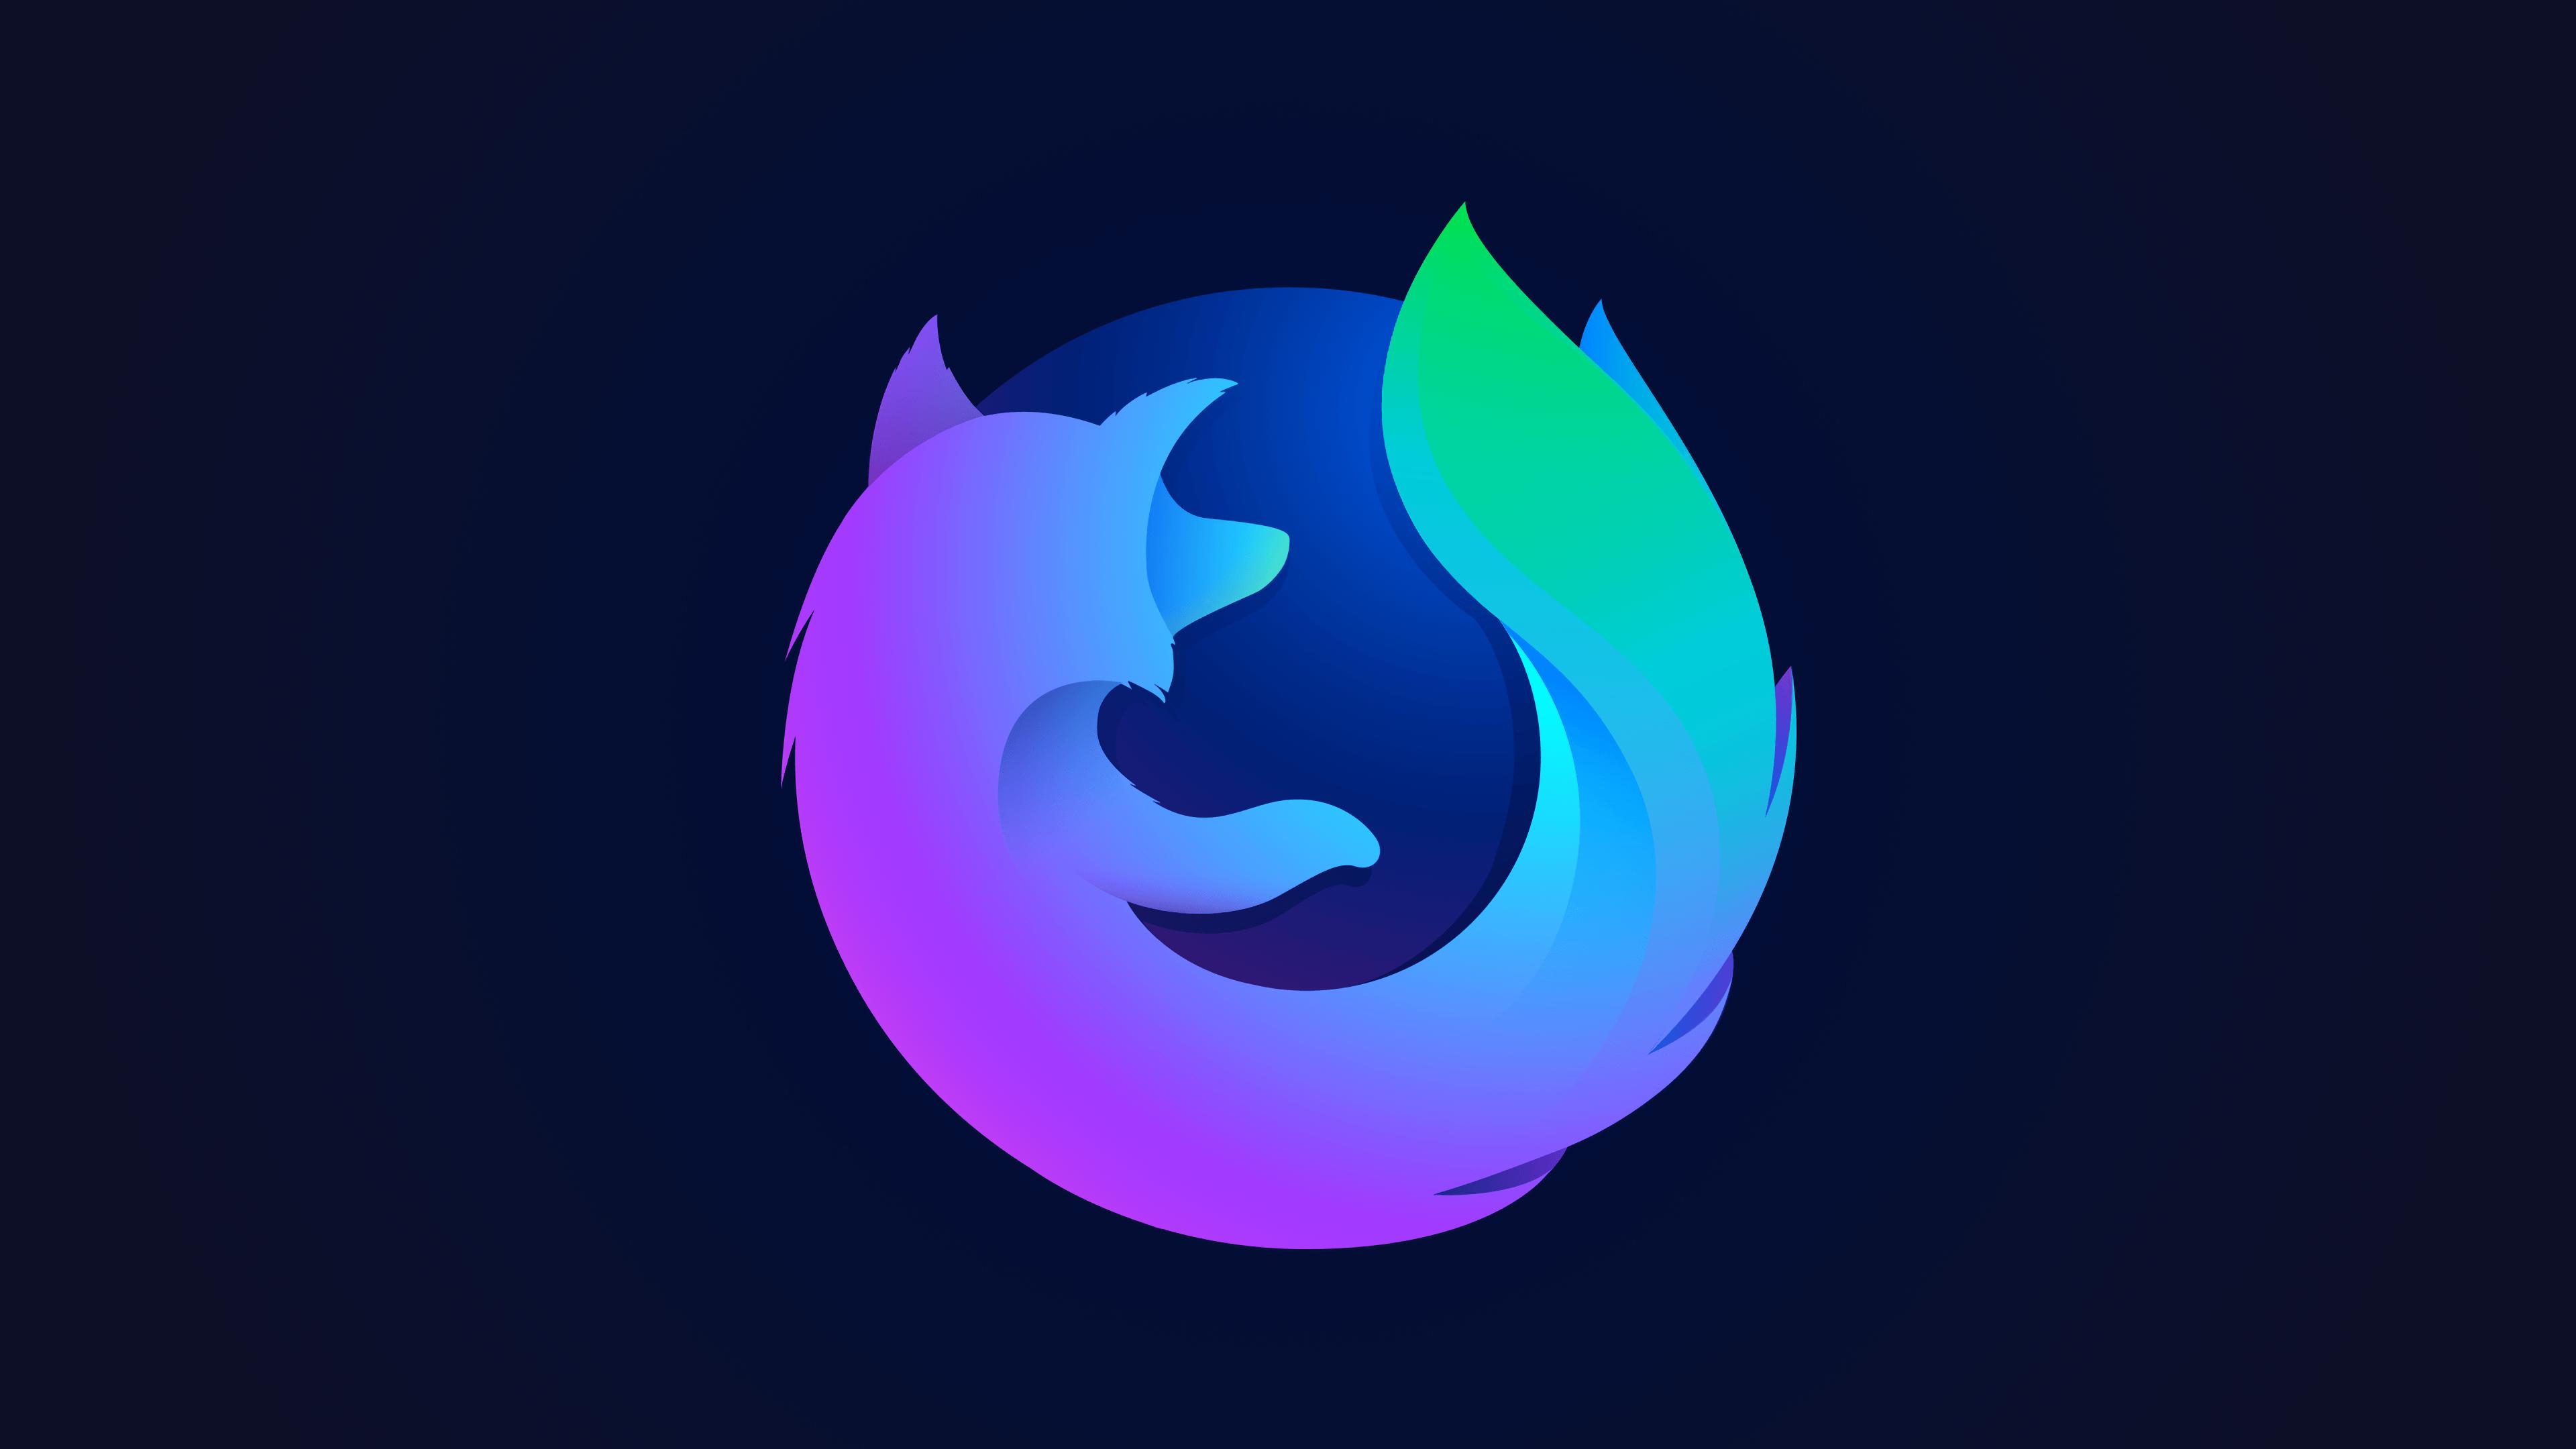 firefox night logo hd wallpaper 67328